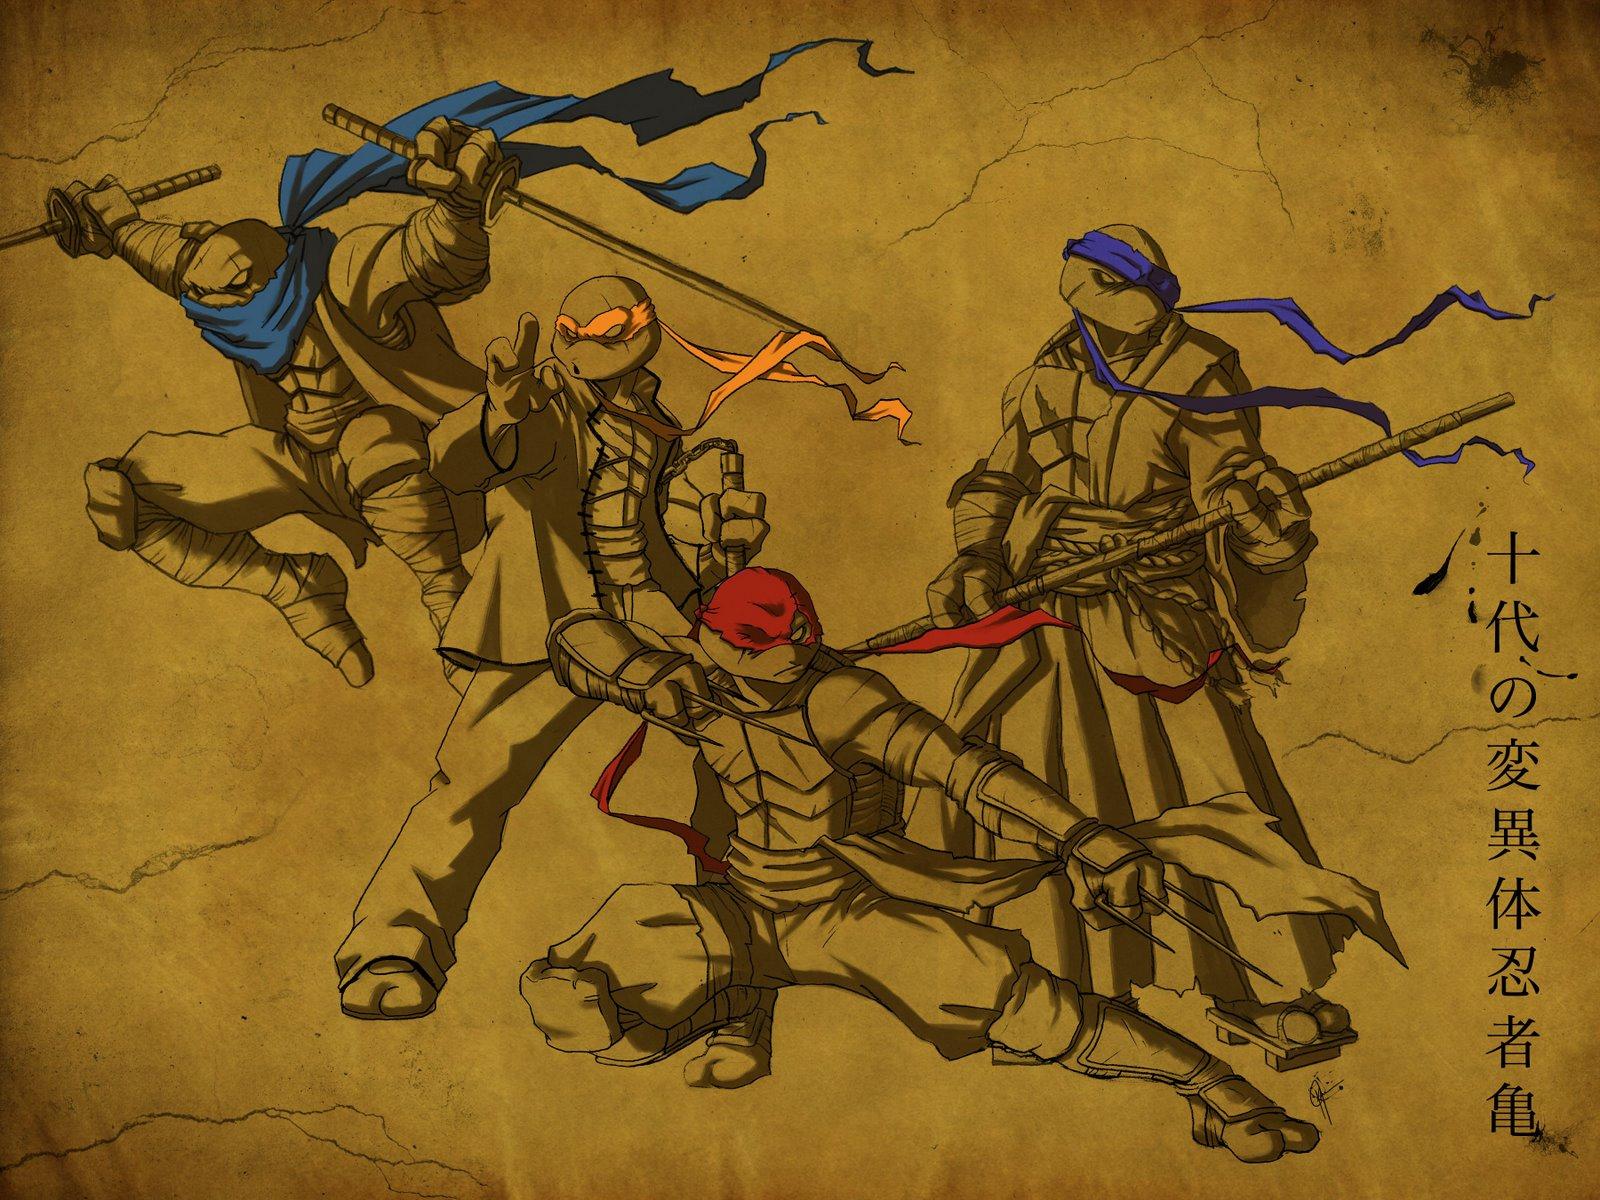 52 teenage mutant ninja turtles hd wallpapers backgrounds wallpaper abyss - Ninja turtles wallpaper ...